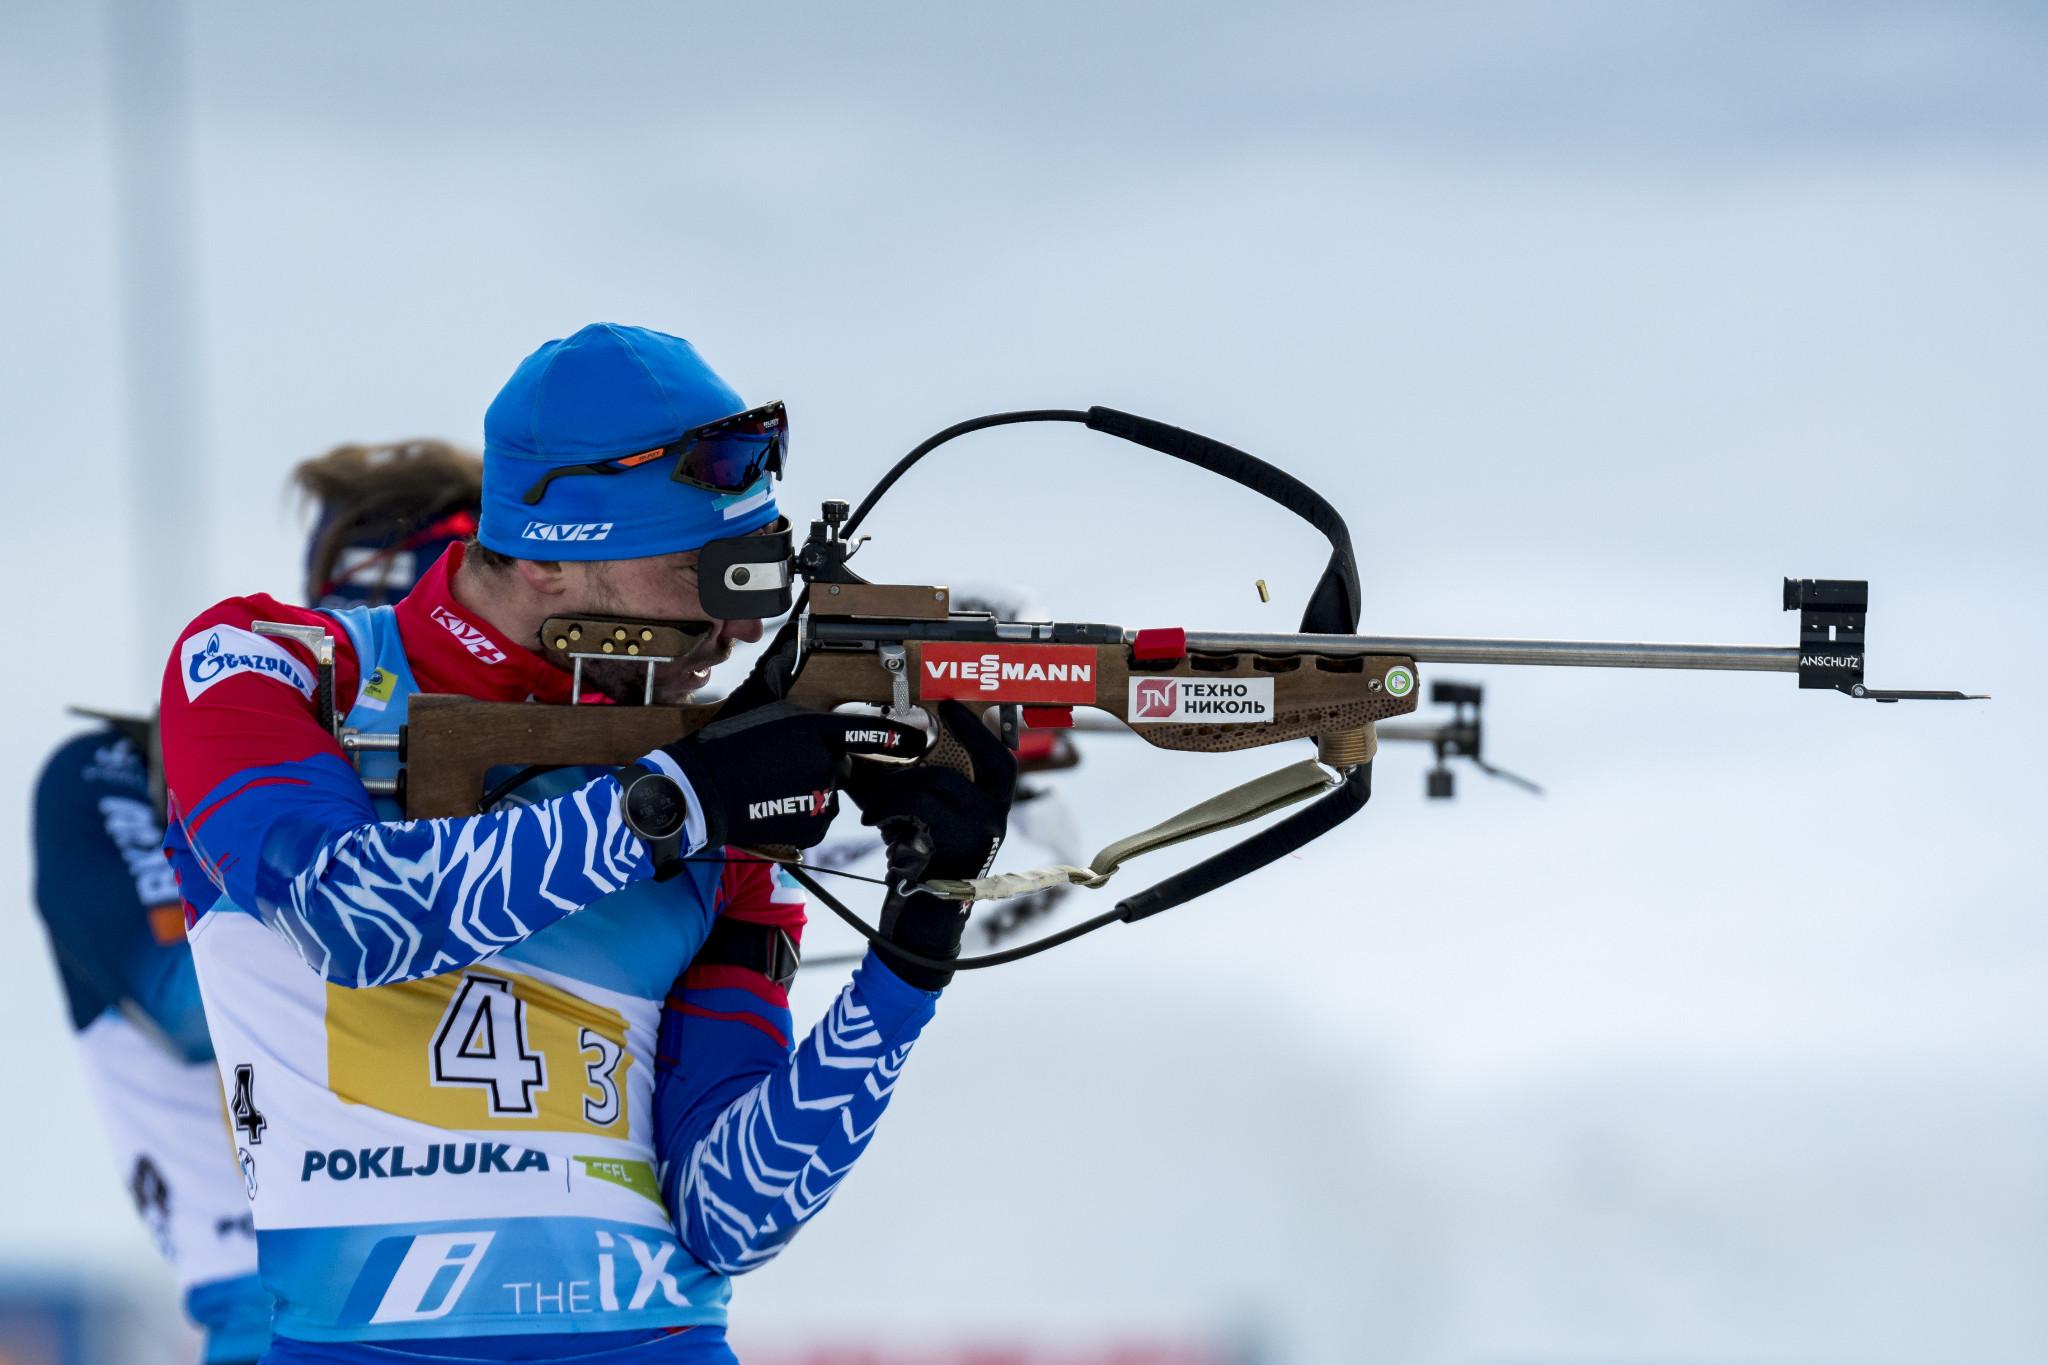 Russian biathlon head coach Polkhovsky to step down for health reasons